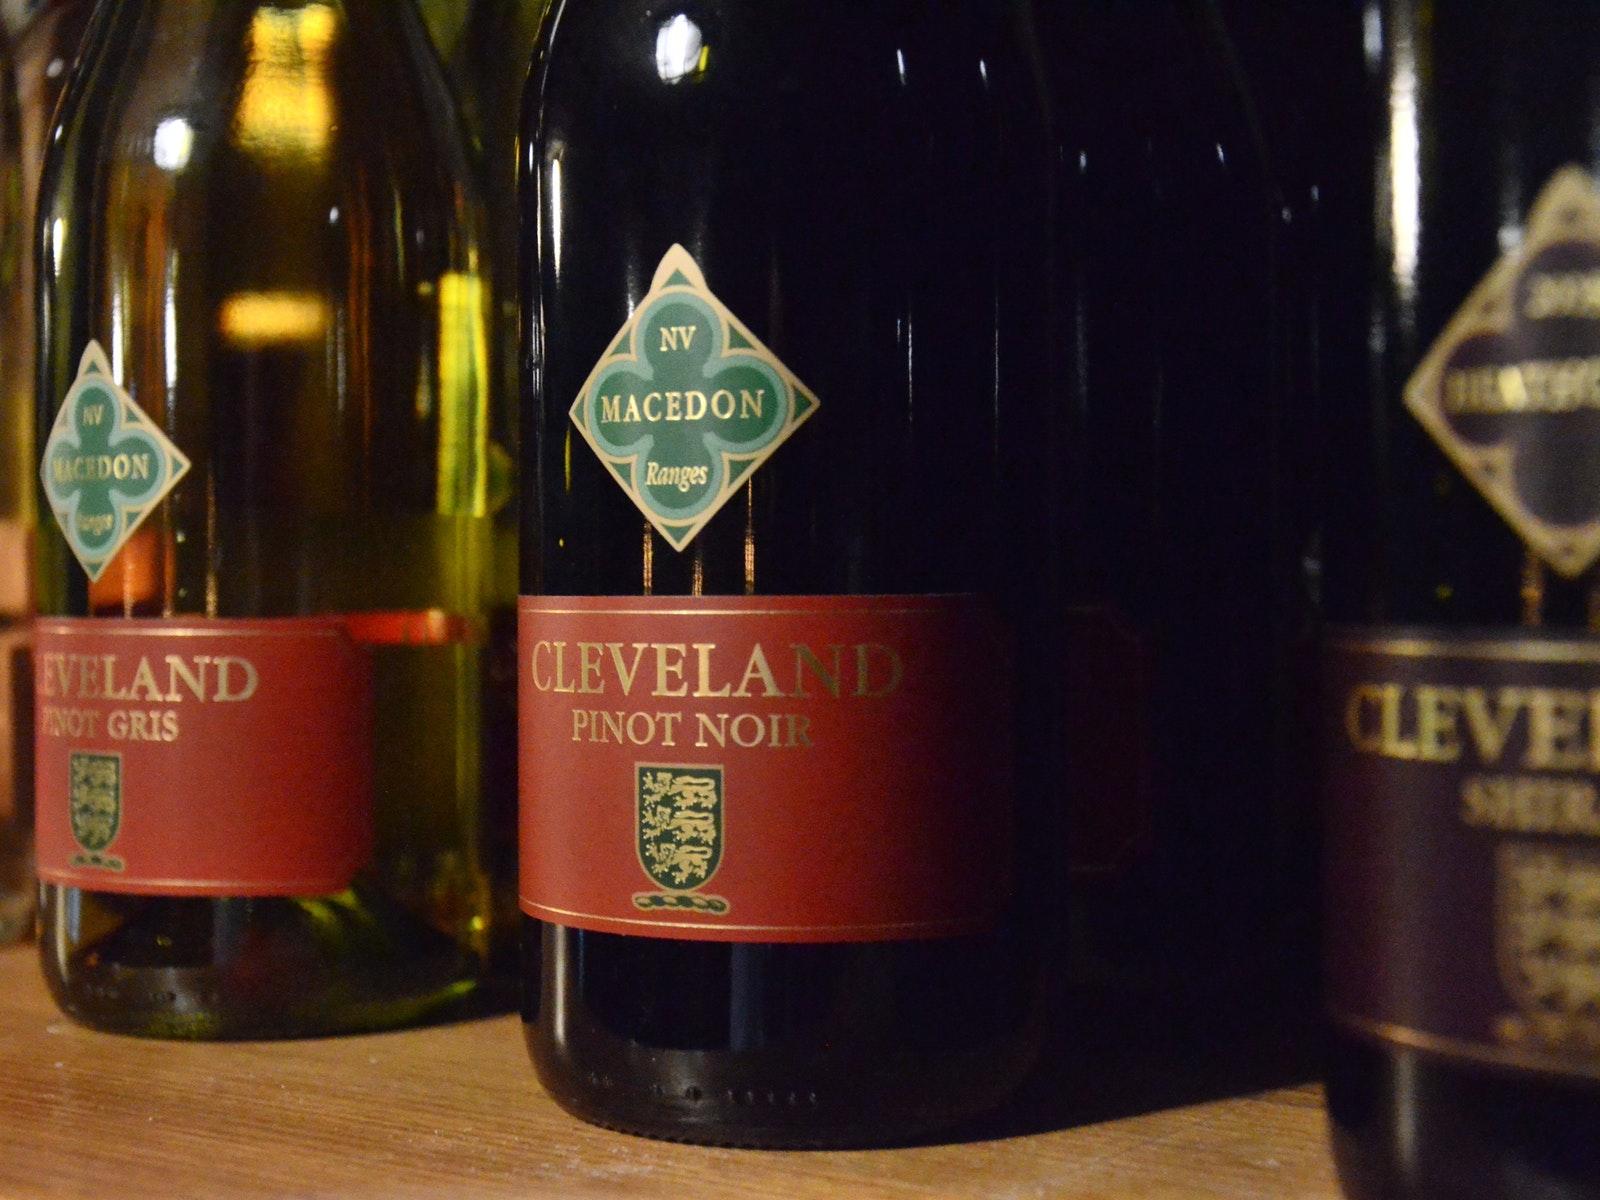 Cleveland Wine bottles